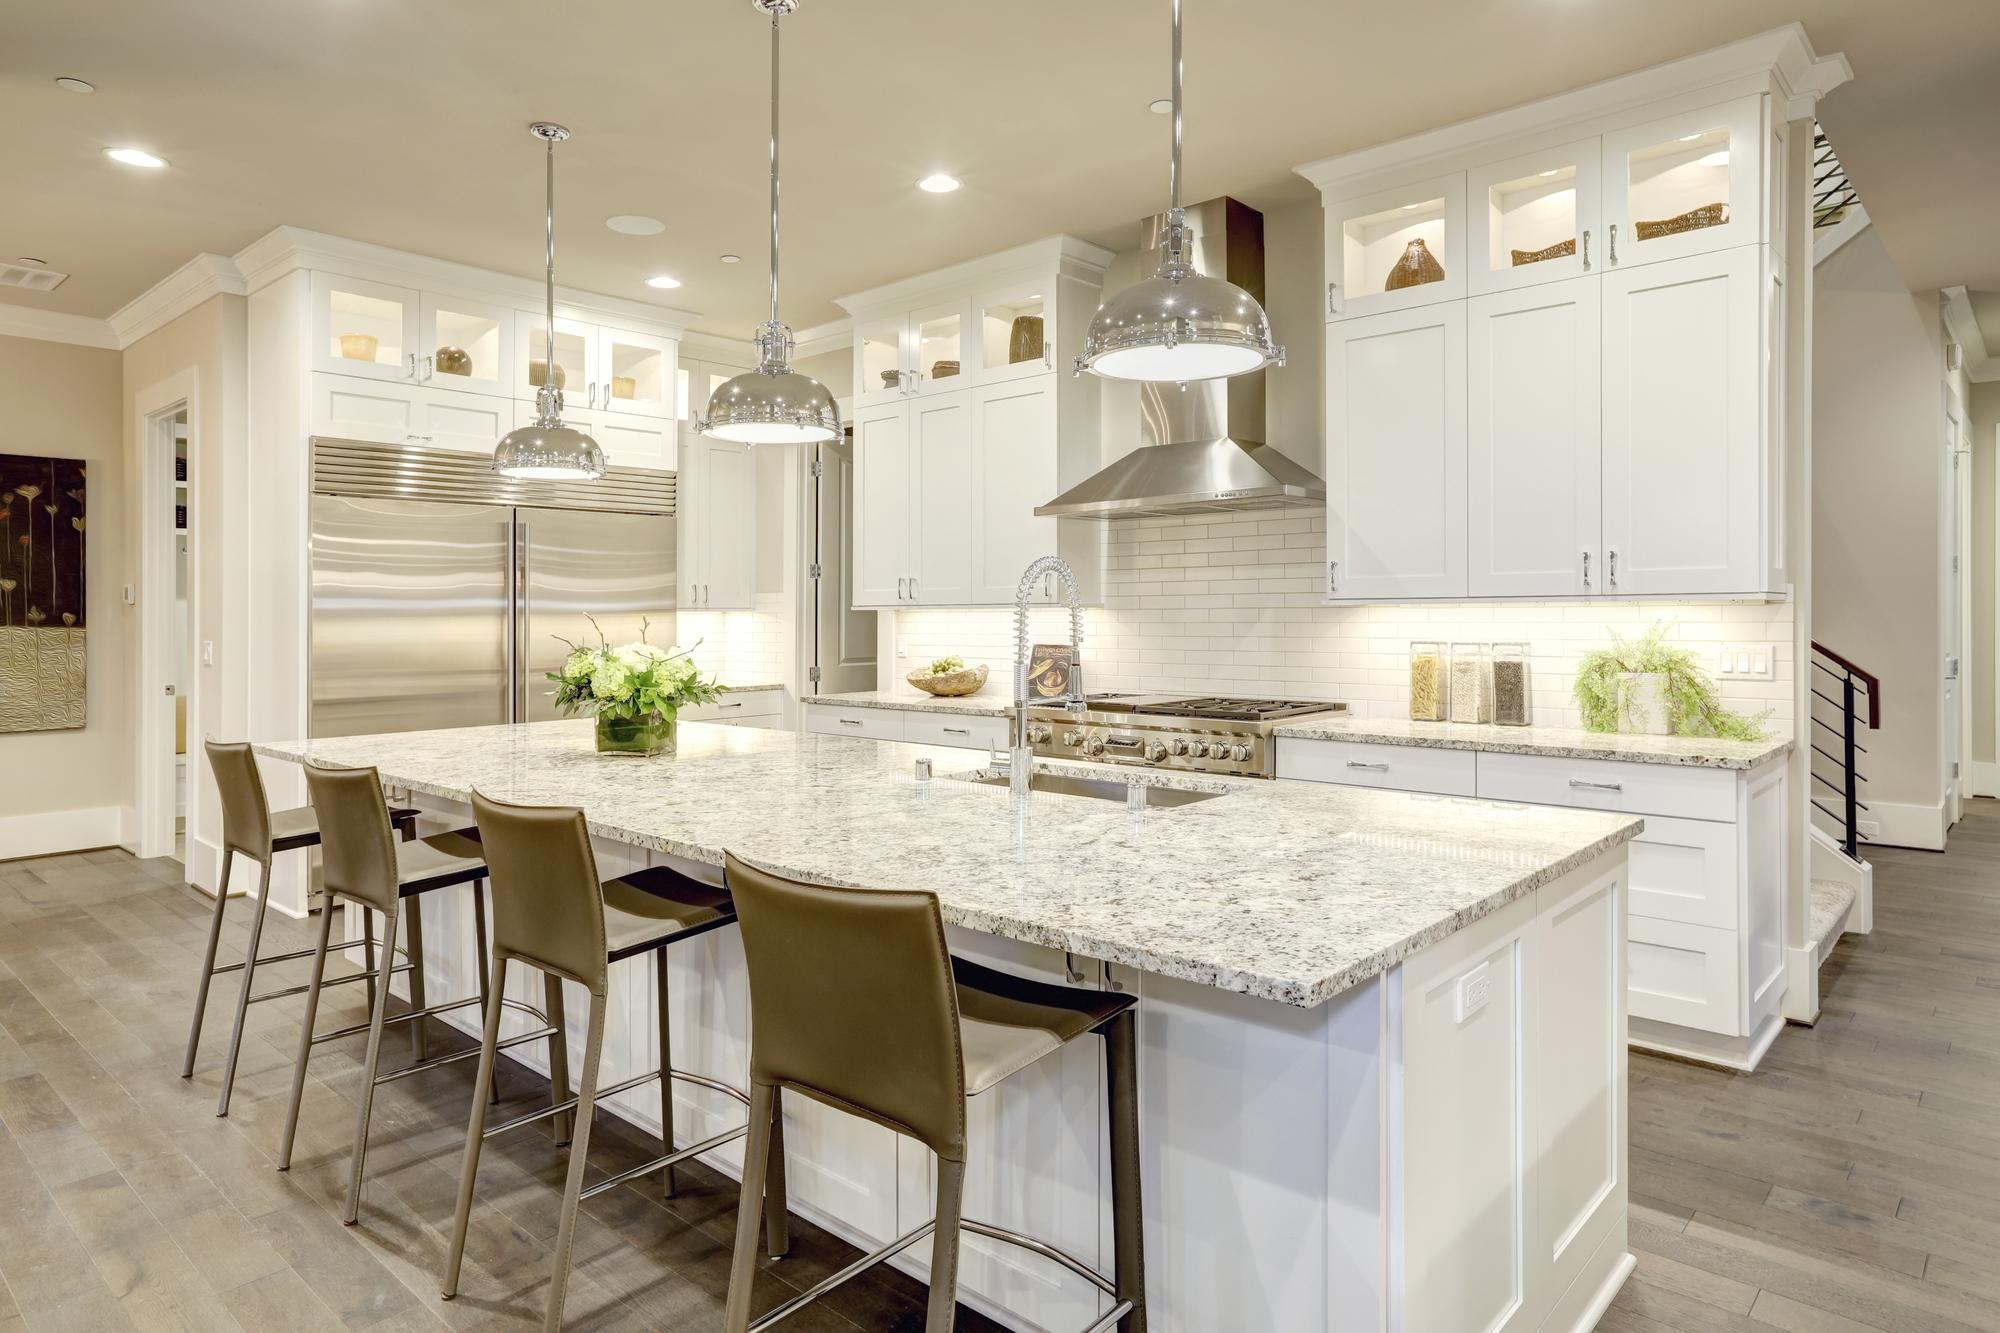 granite kitchen counters benches countertops madison evansville janesville waukesha jpg